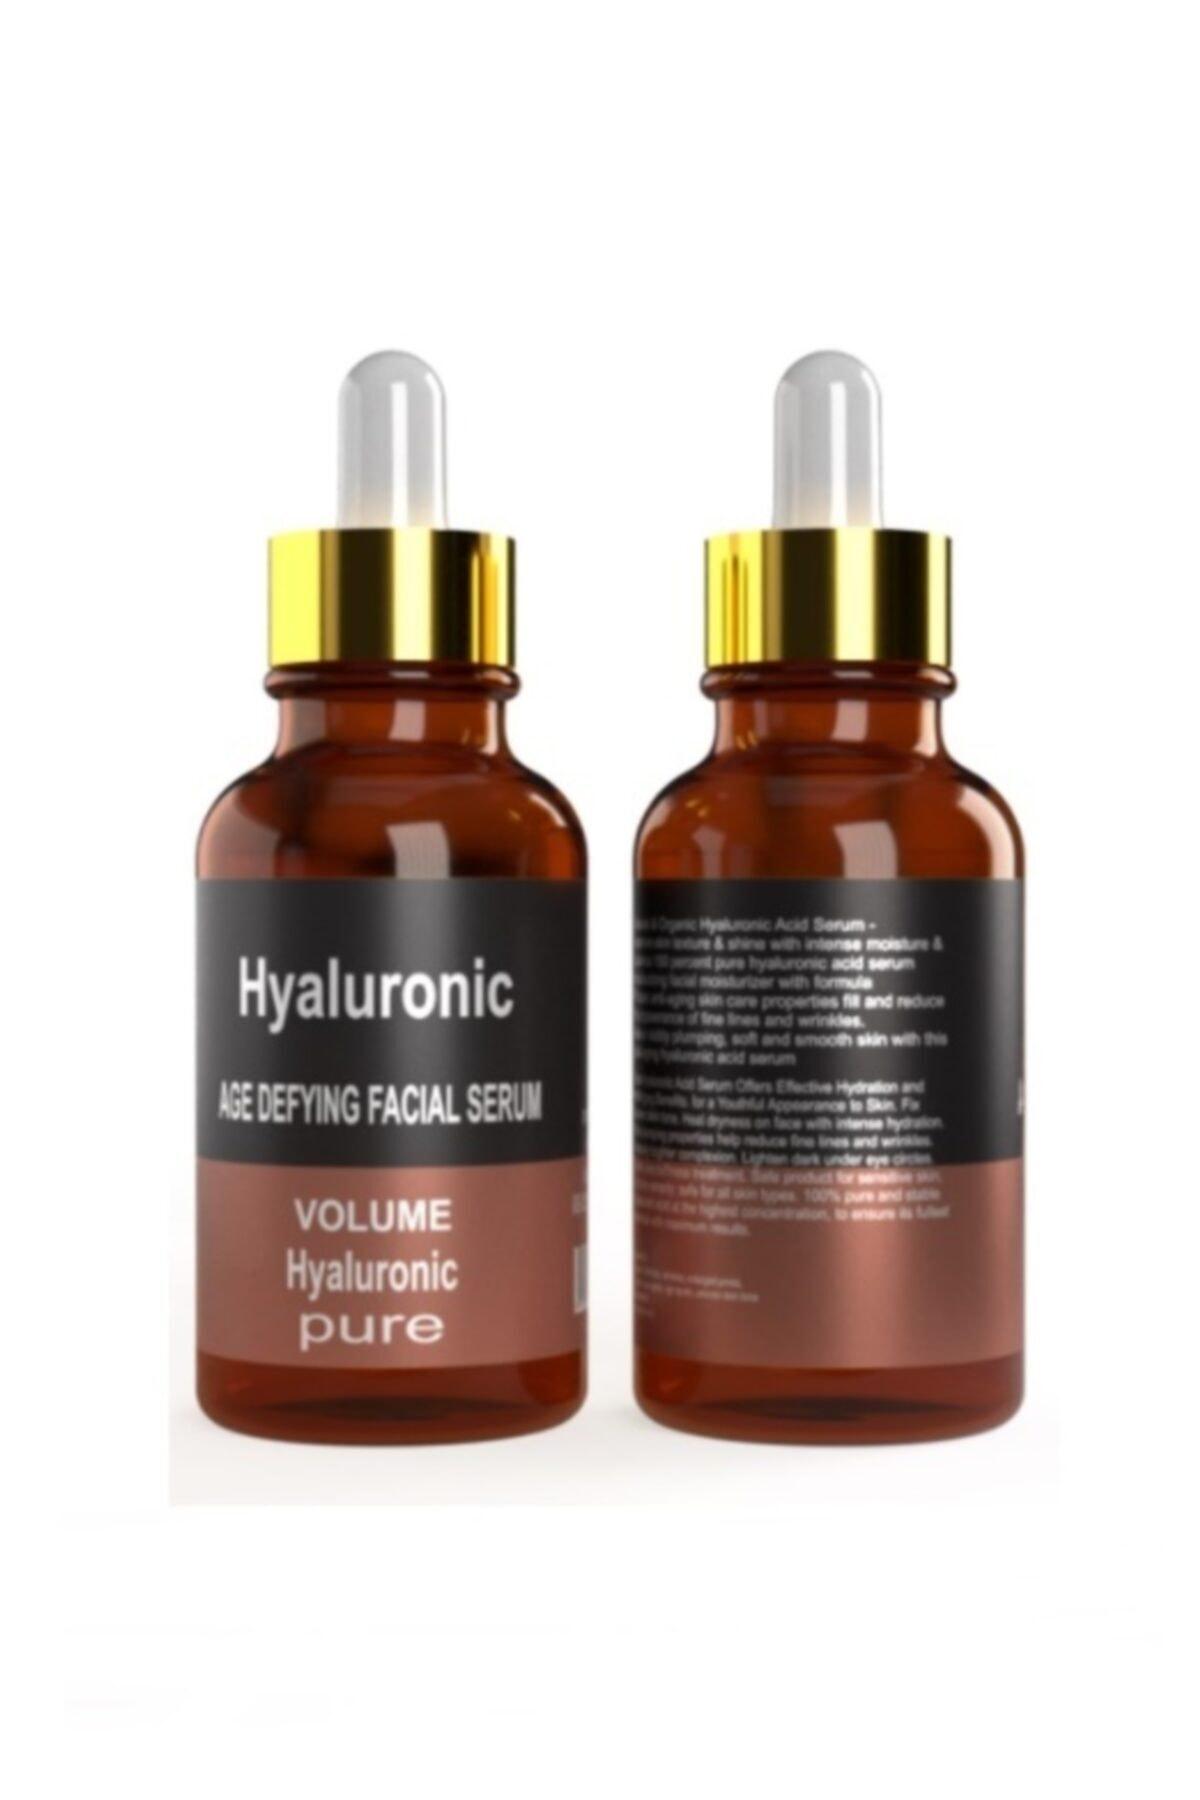 Pure Retinol & Vitamin C & Hyaluronic Acid & Glikolik Asit - 4'lü Set 2